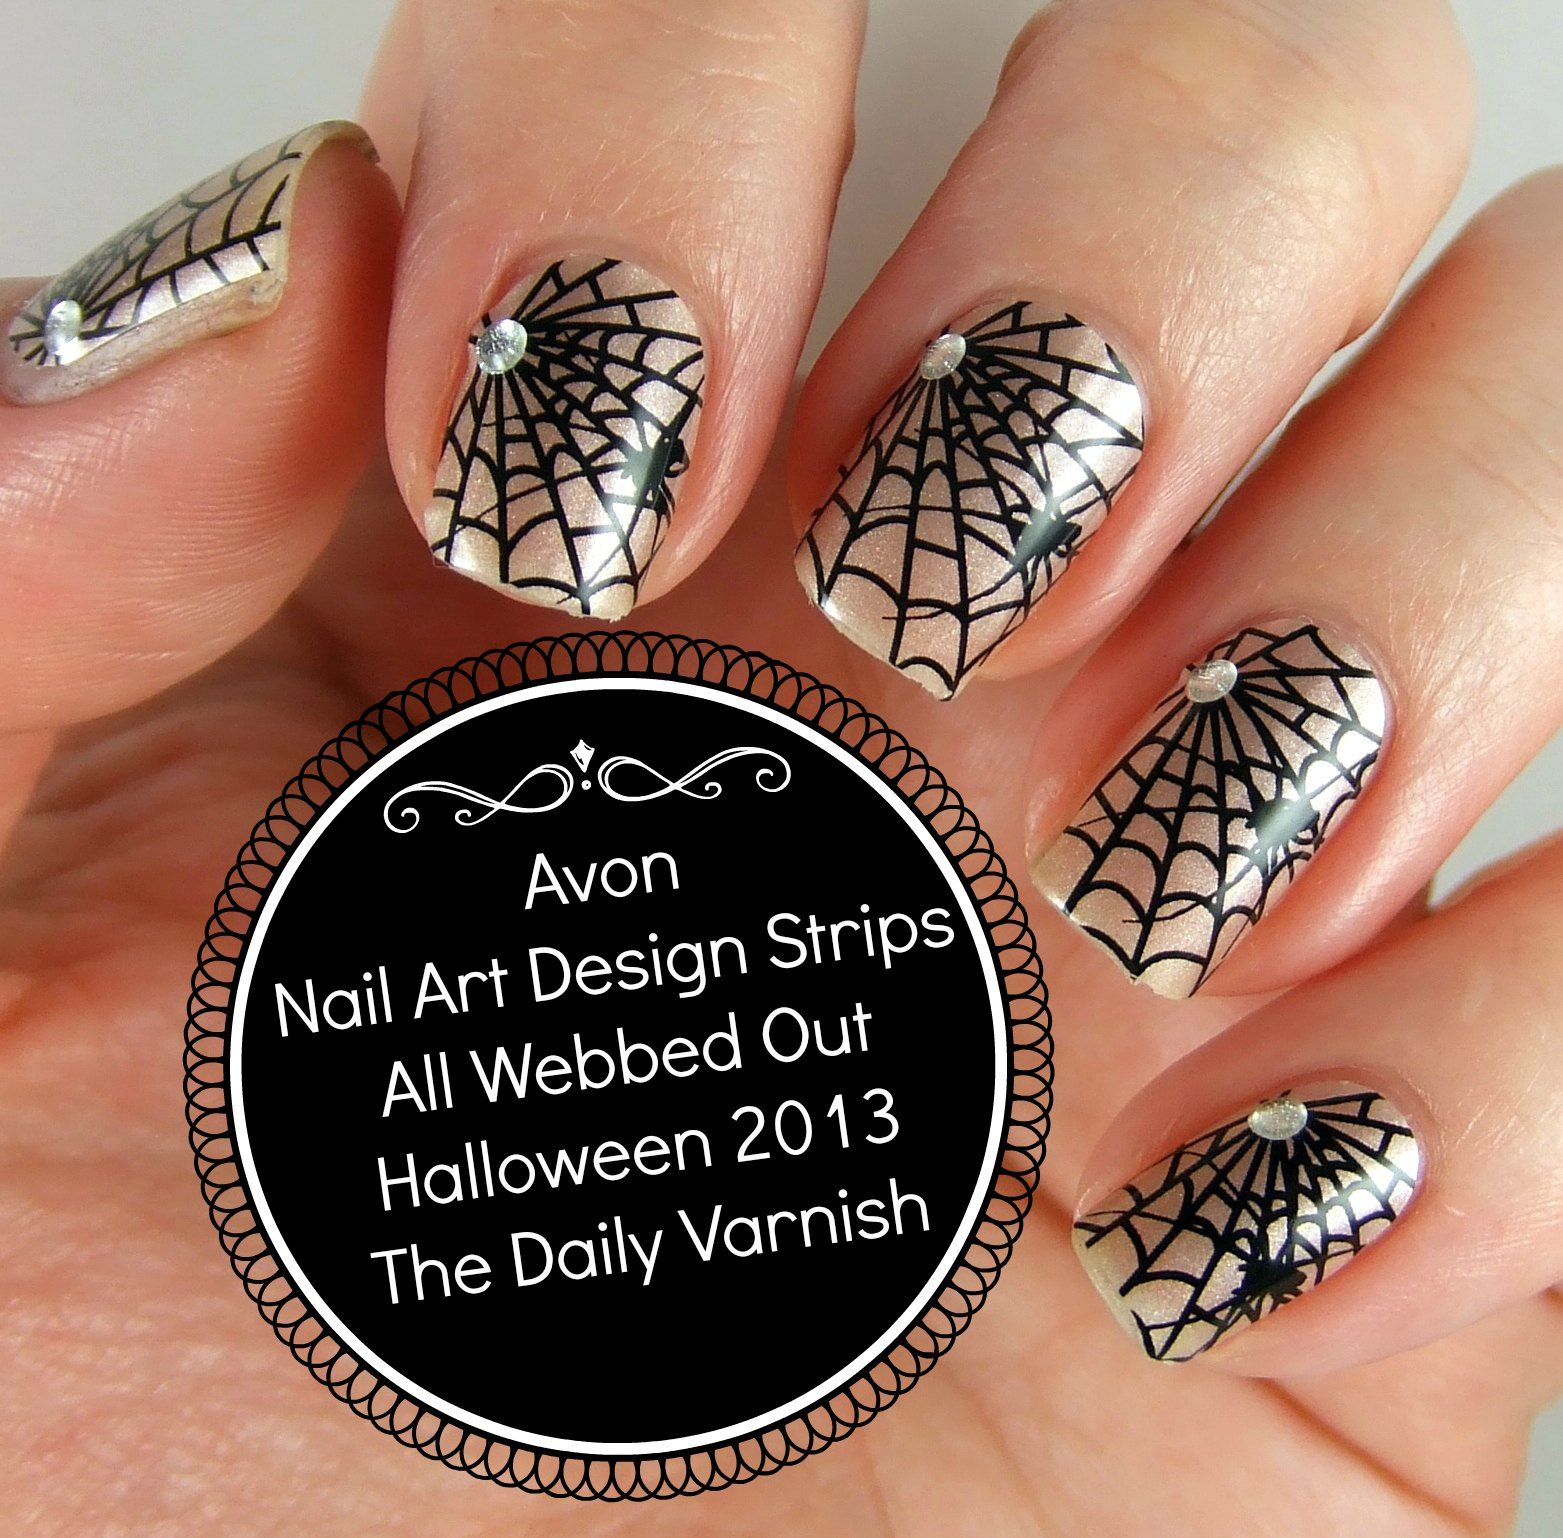 Nail Design Strips - Nail Design Strips Great Nail Art Design Pinterest